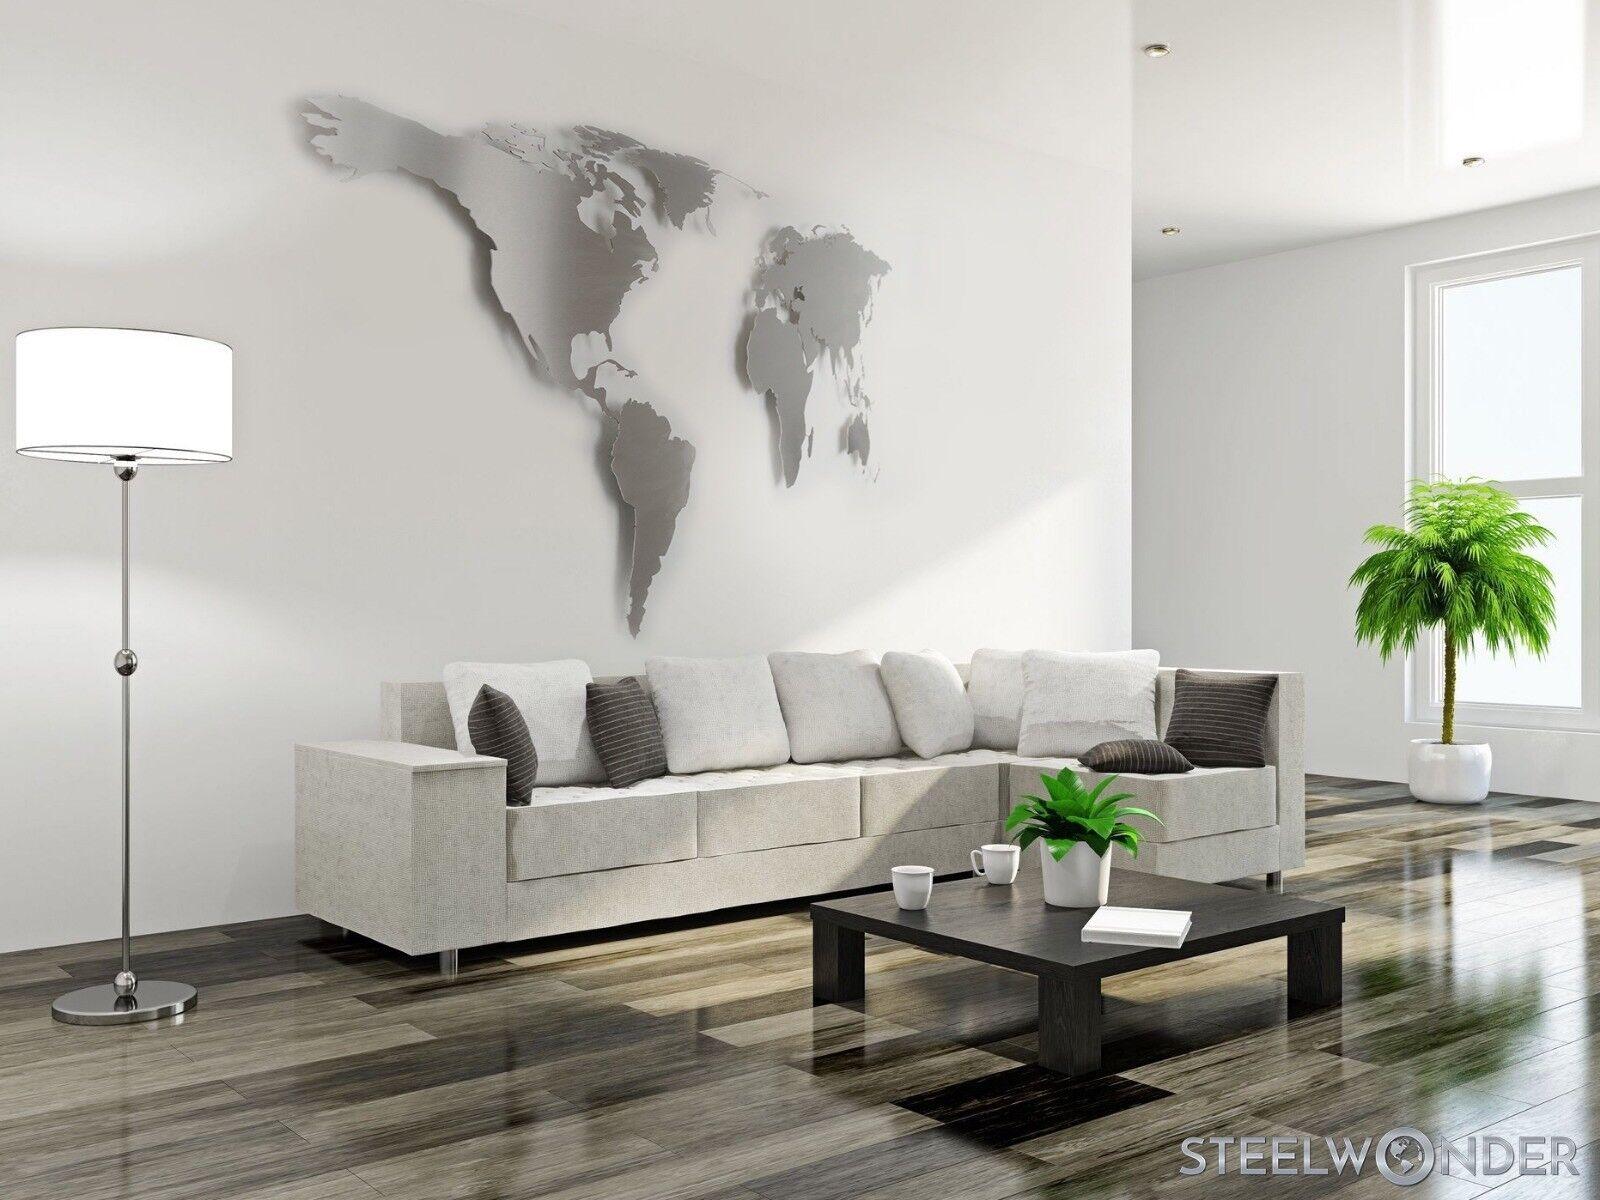 Weltkarte Edelstahl XXL 200x100cm Wandbild Wanddeko Stahl Reisen Urlaub Urlaub Urlaub | Langfristiger Ruf  9712e9